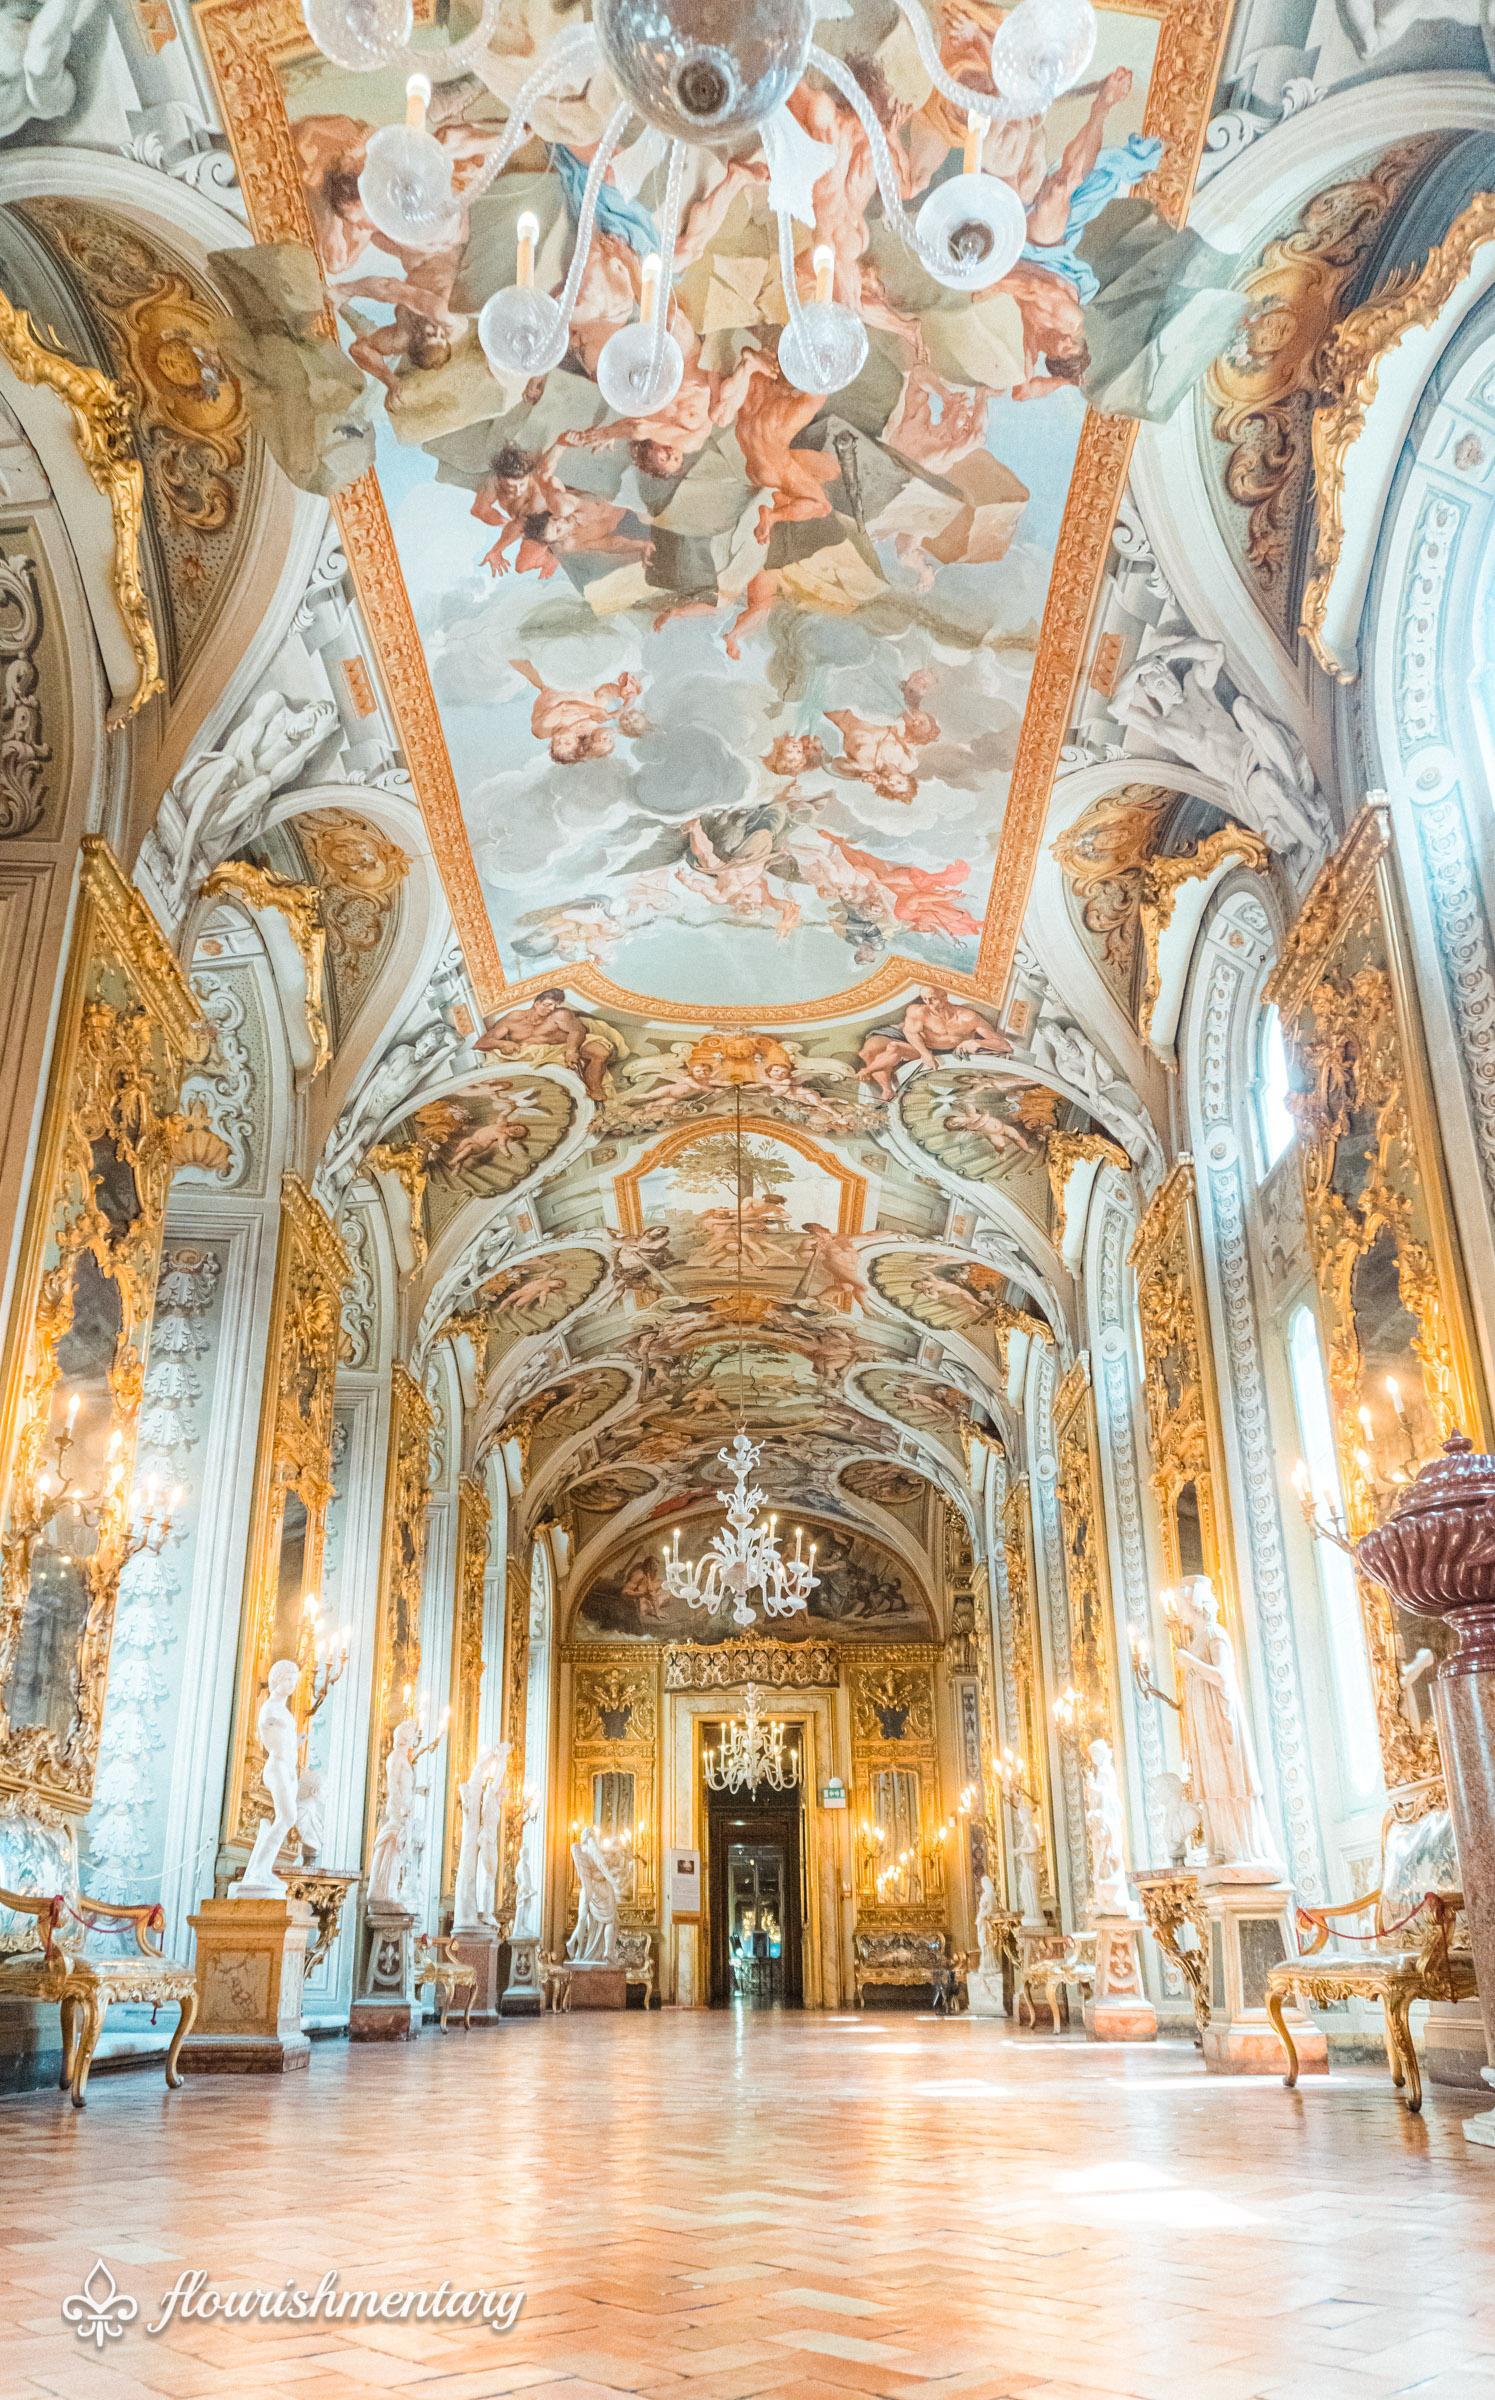 The Hall Of Mirrors Inside The Galleria Doria Pamphilj